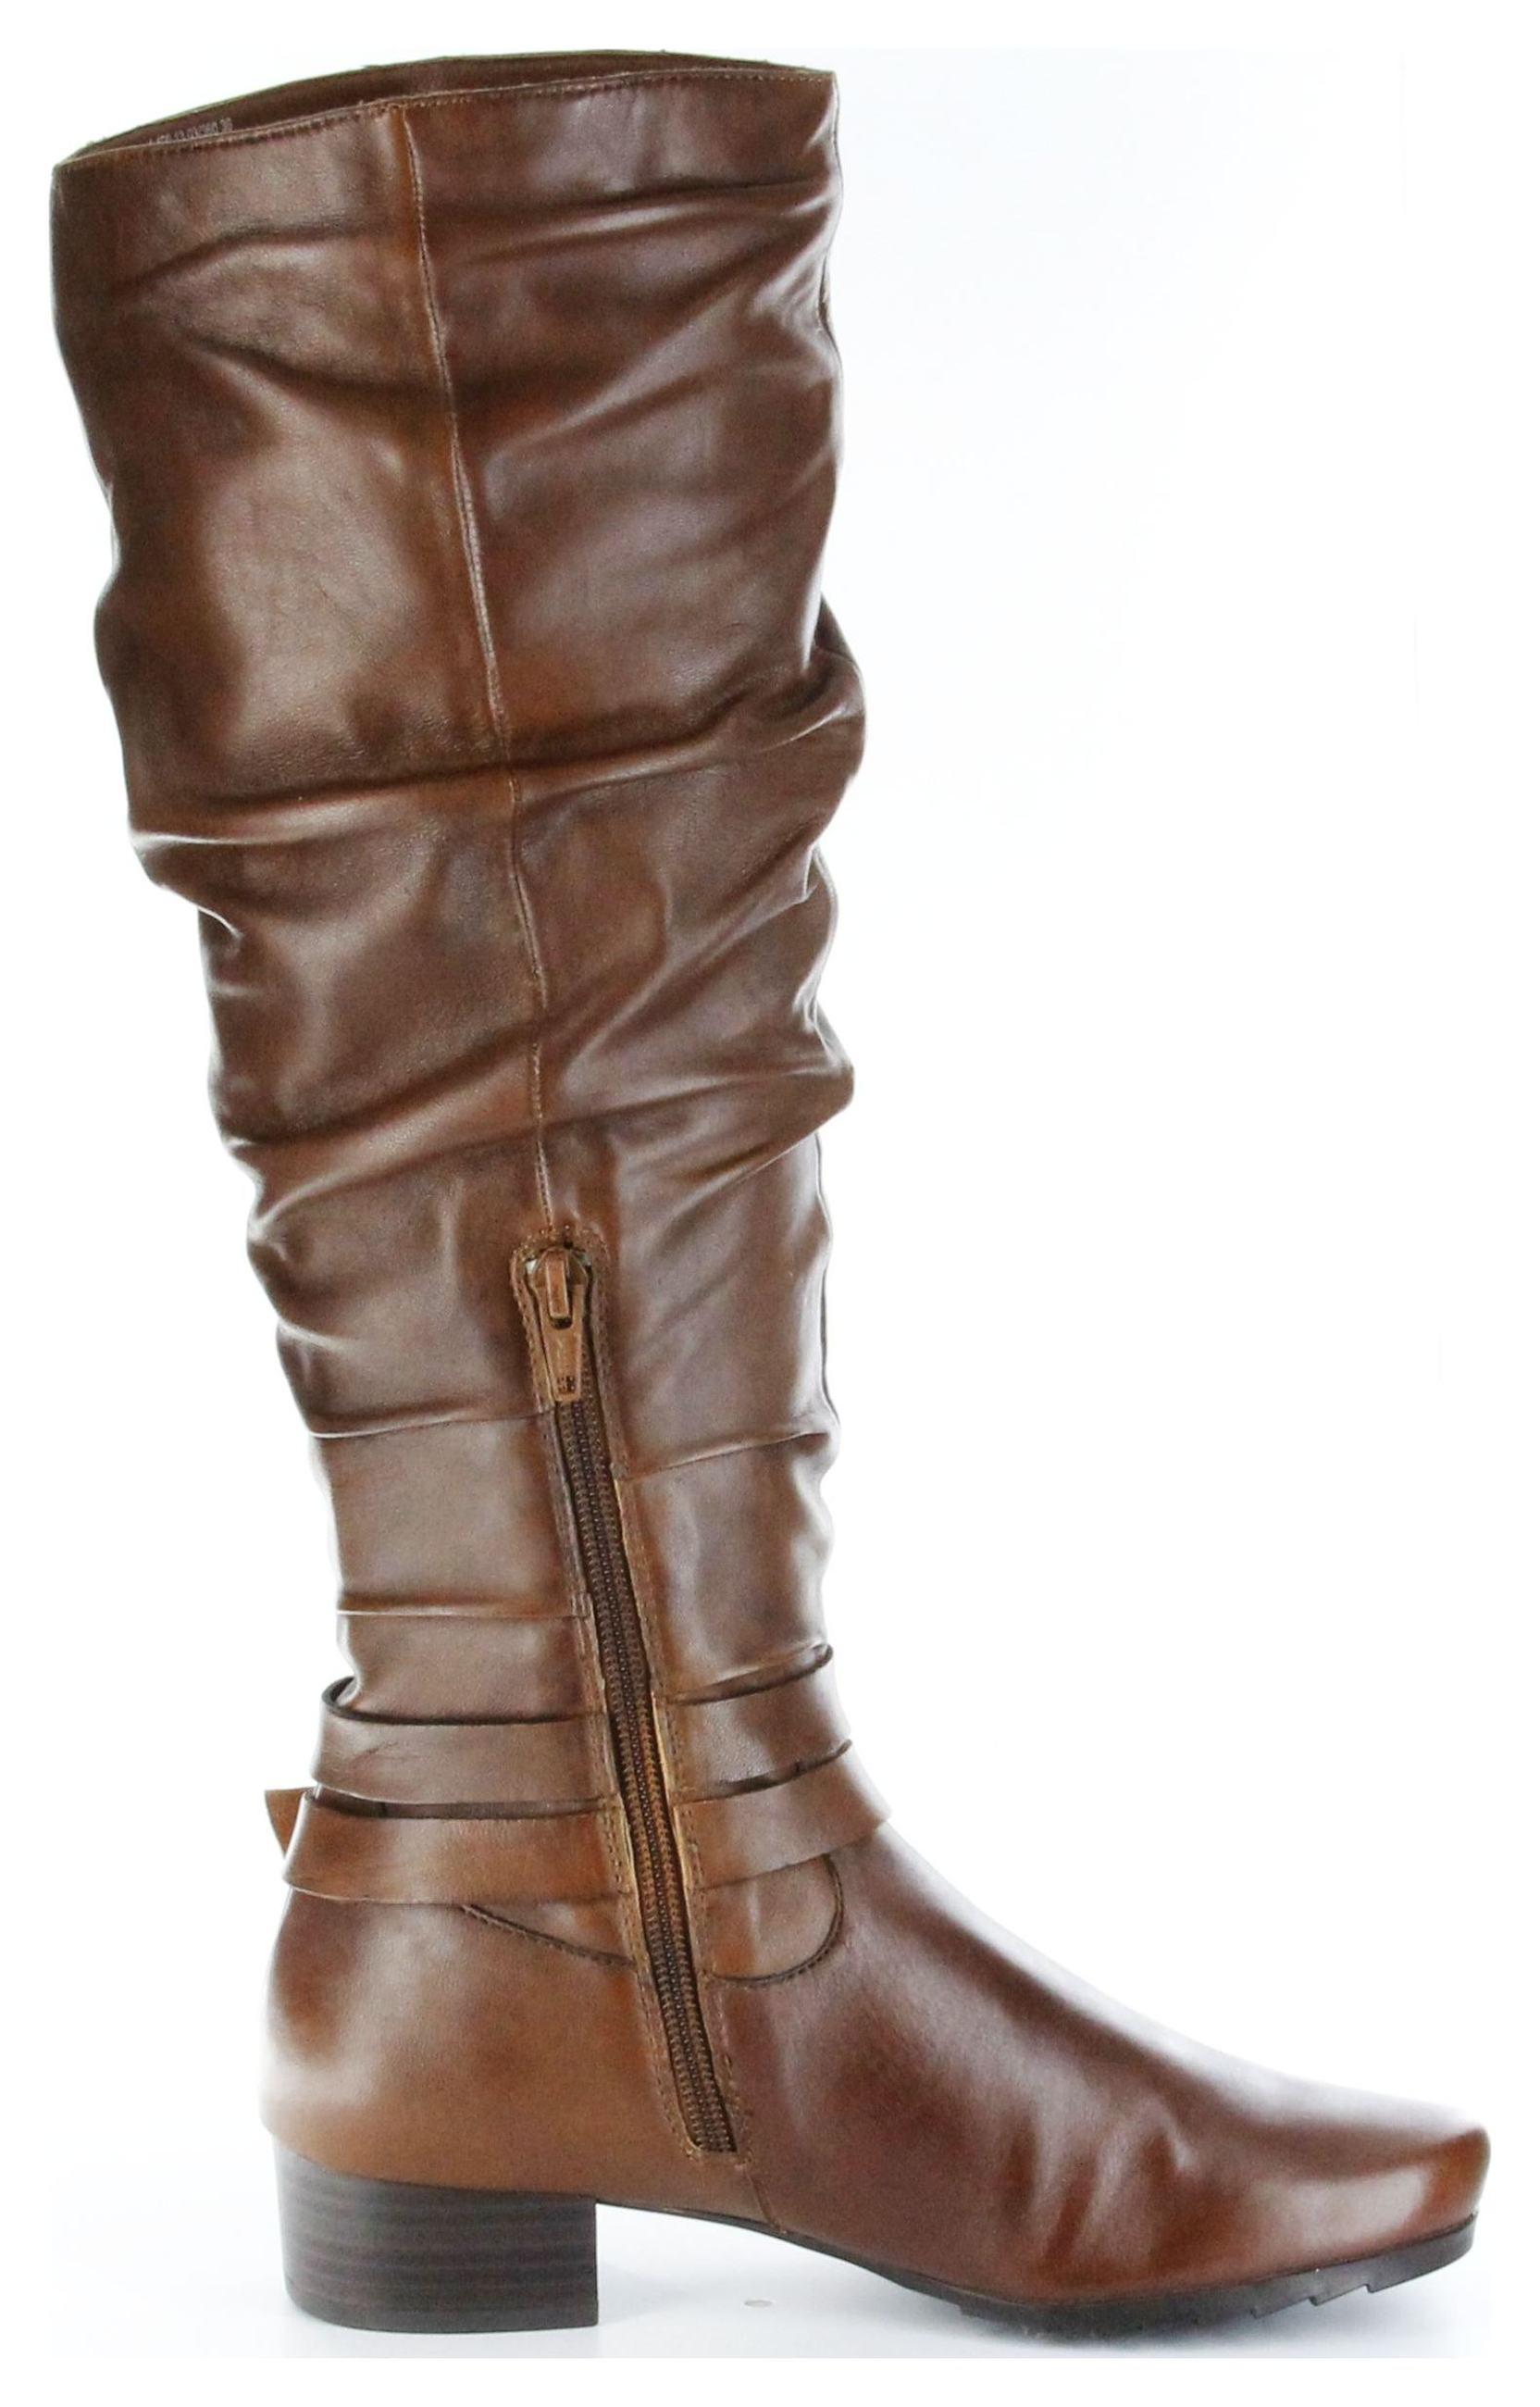 Marc Stiefel braun Damen Glattleder hochwertige Schuhe Madina 1.420.13 03 cognac